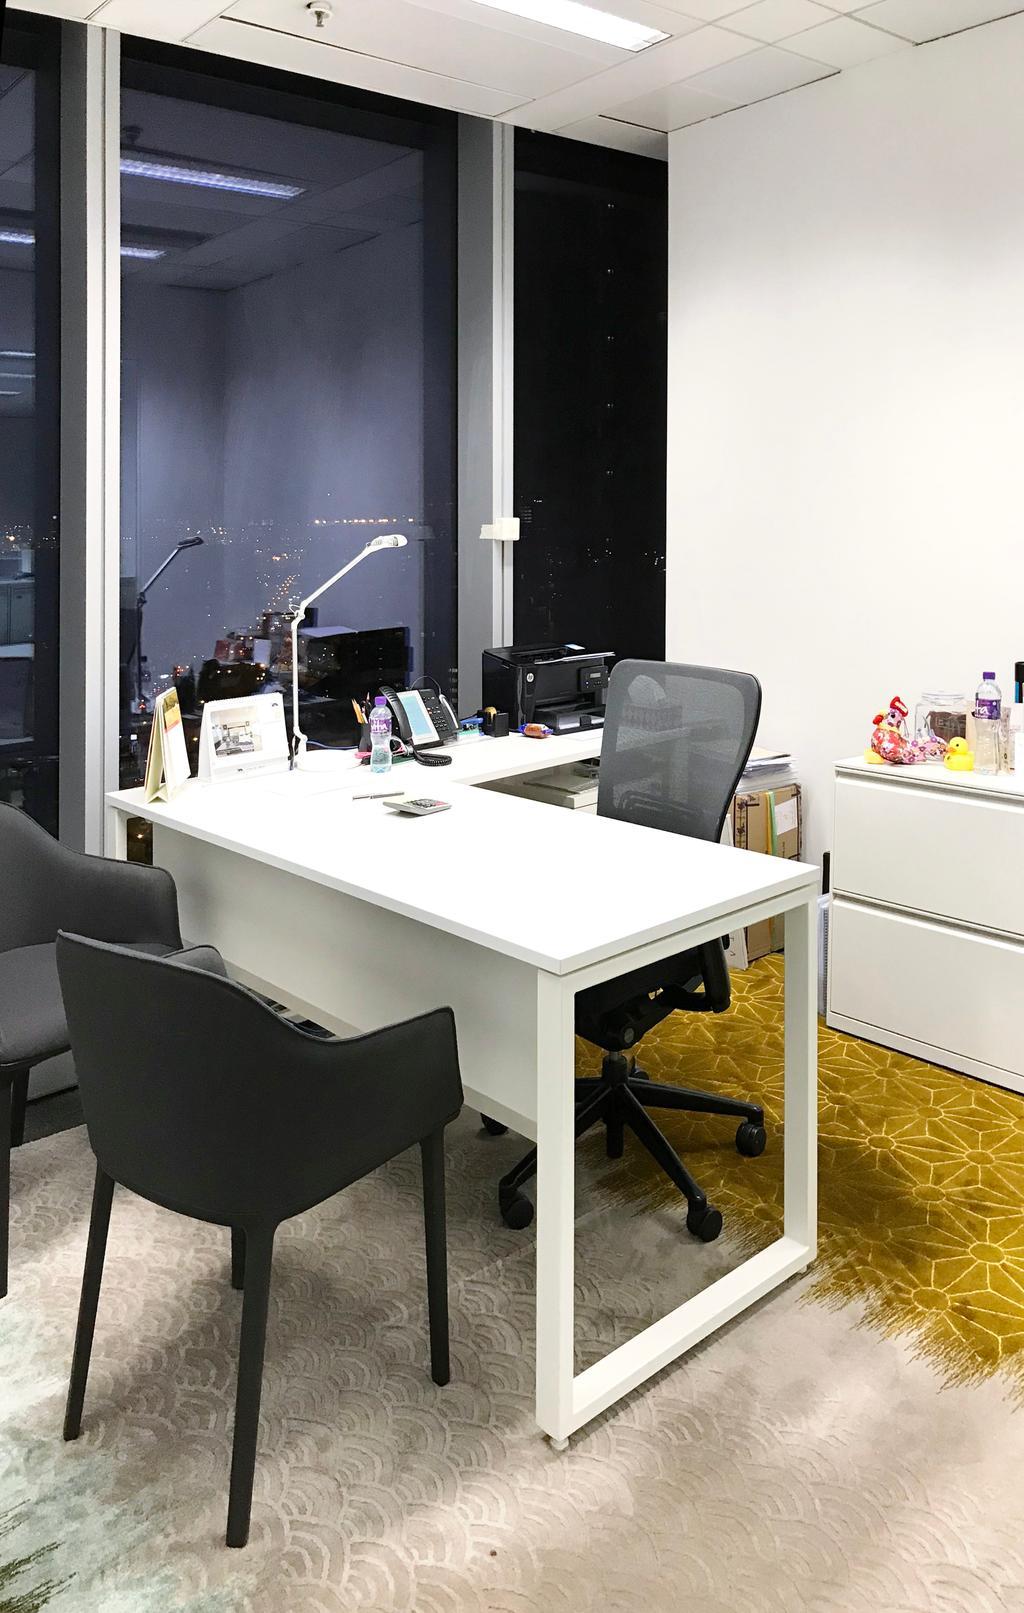 Tai Ping Carpets International Limited, 商用, 室內設計師, MAD Studio Limited